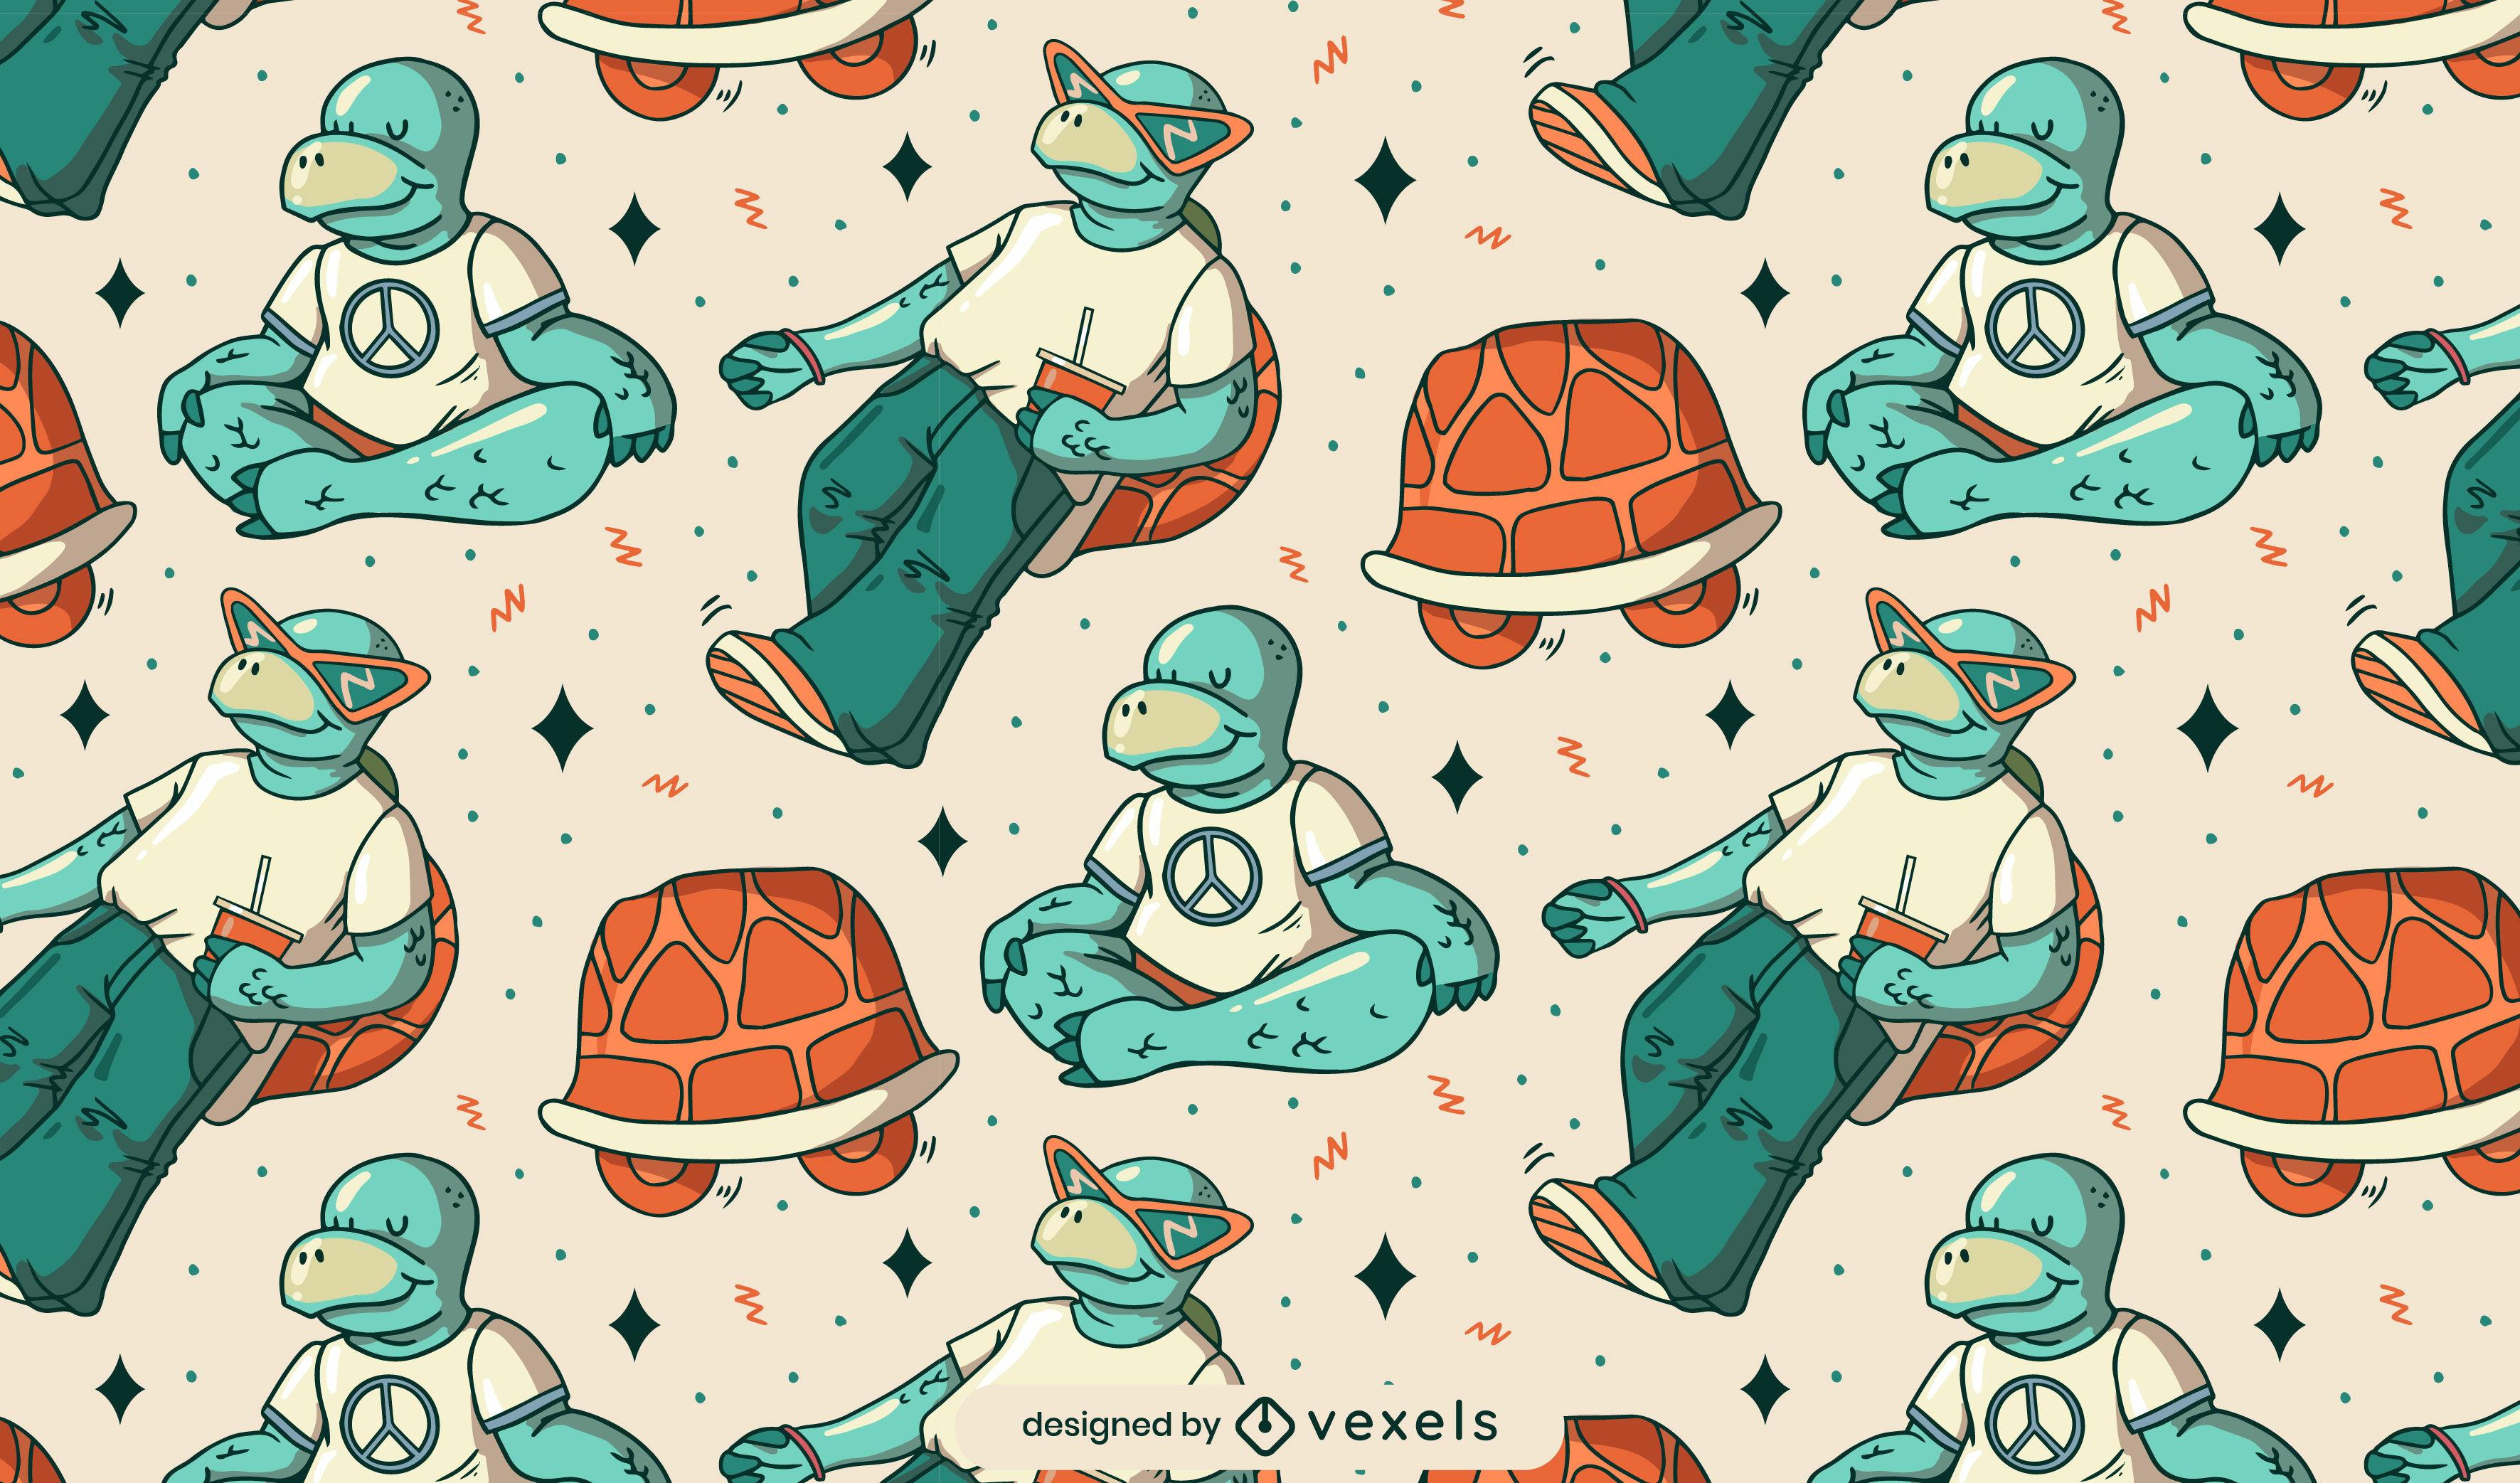 Cartoon turtle characters pattern design